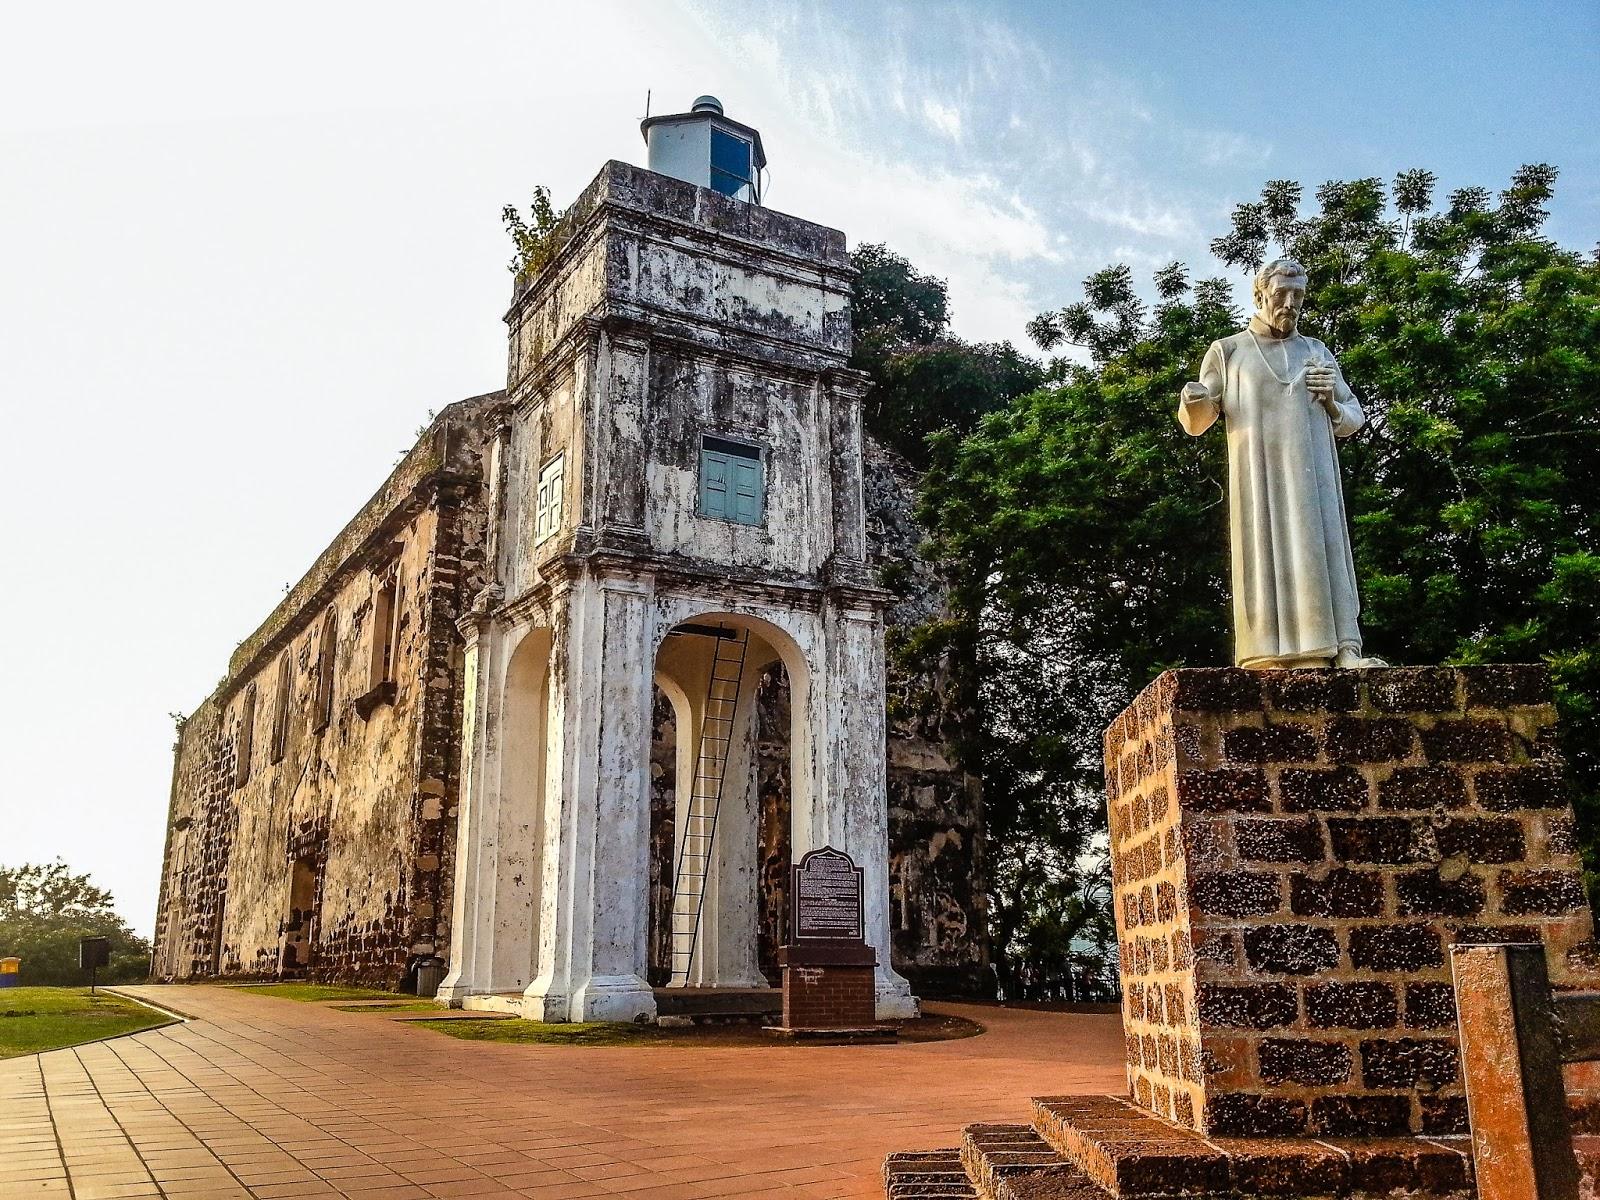 nha-tho-thanh-saint-paul-malaysia-viettourist (3)